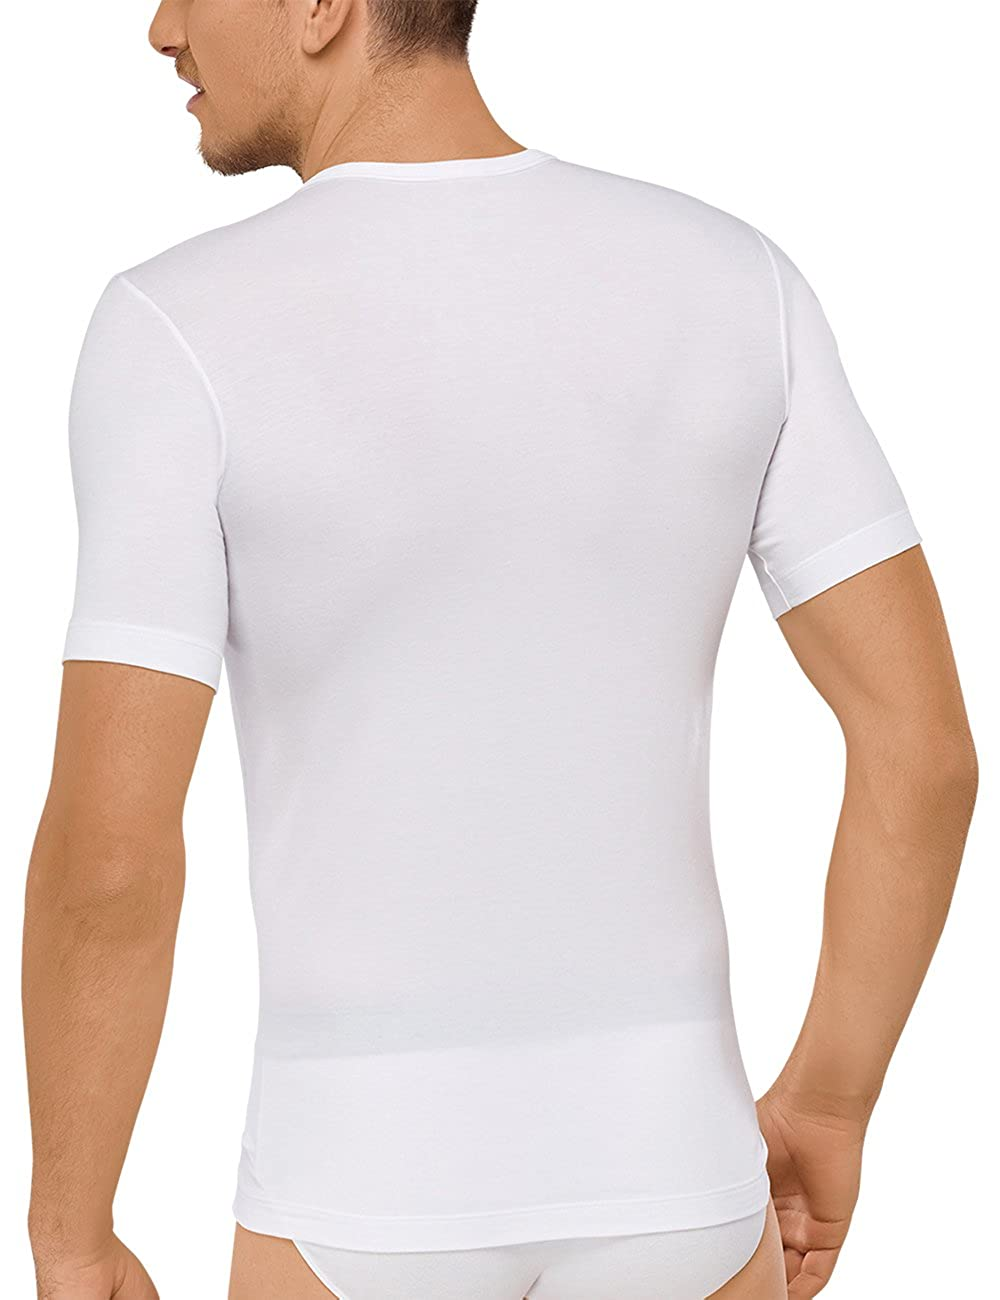 Schiesser Herren Unterhemd per of 2